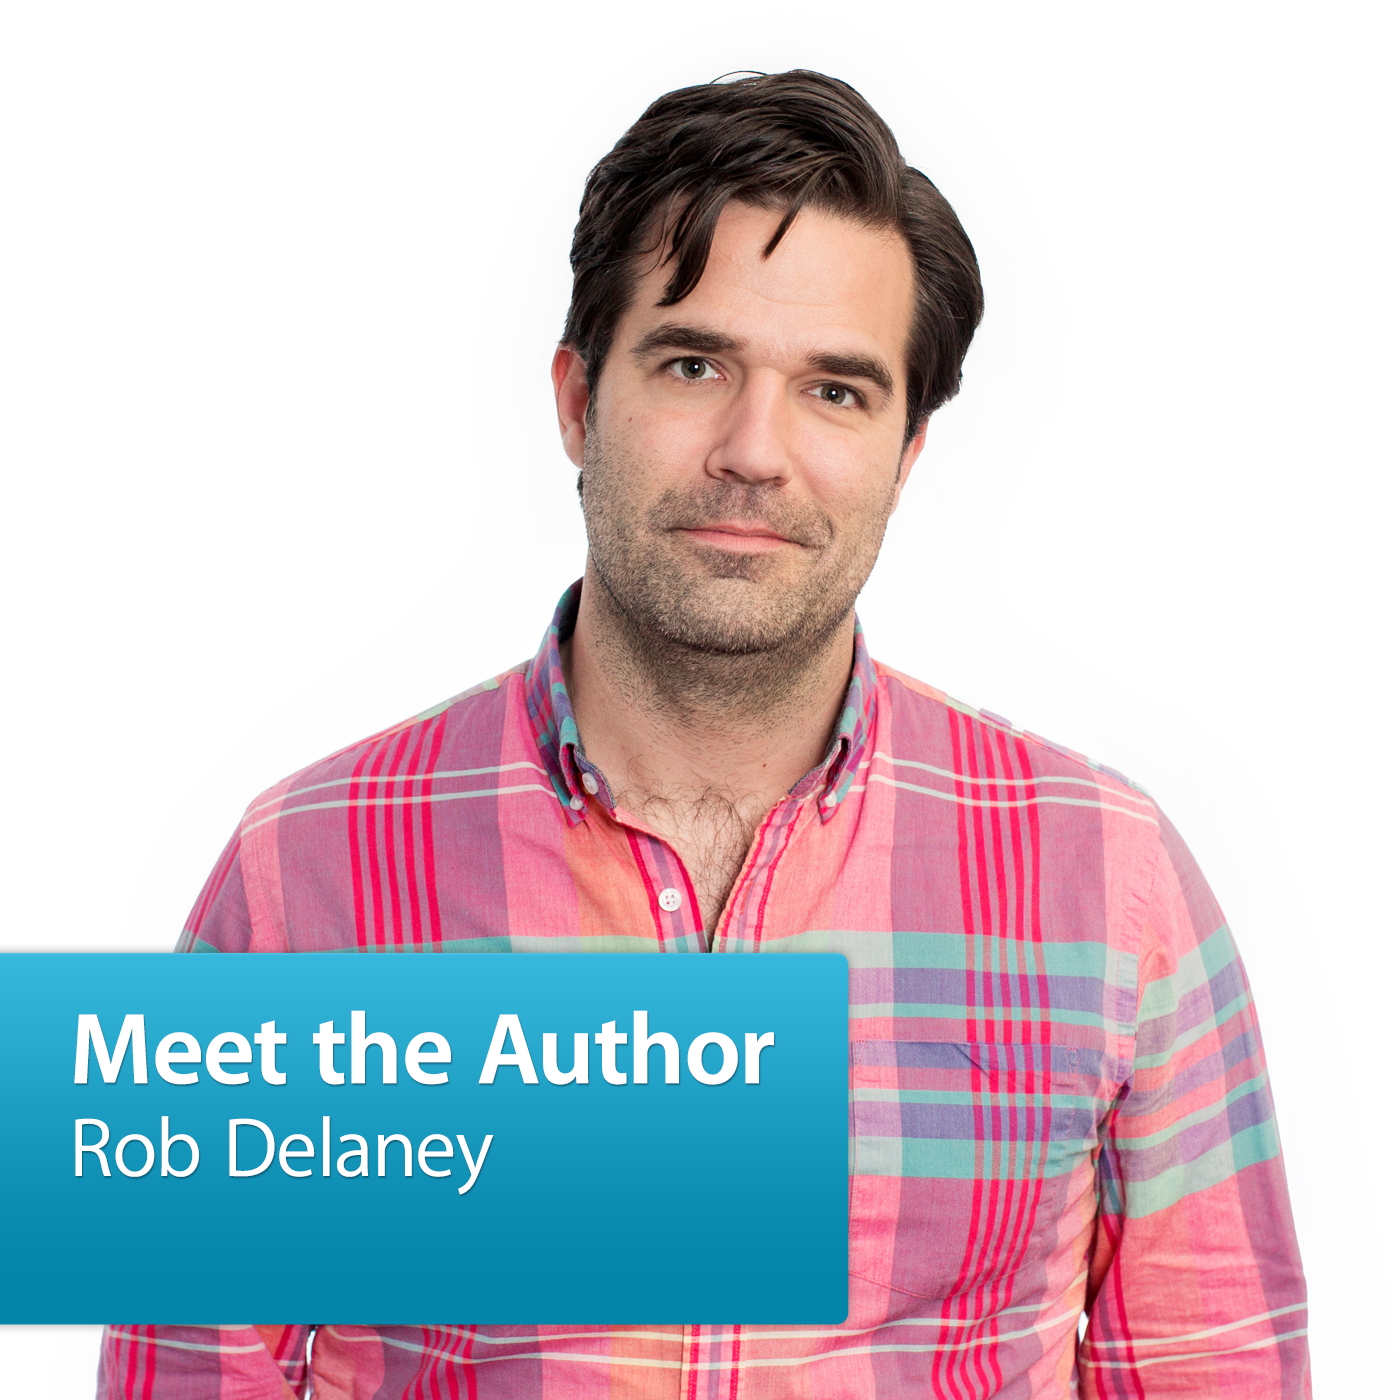 Rob Delaney: Meet the Author